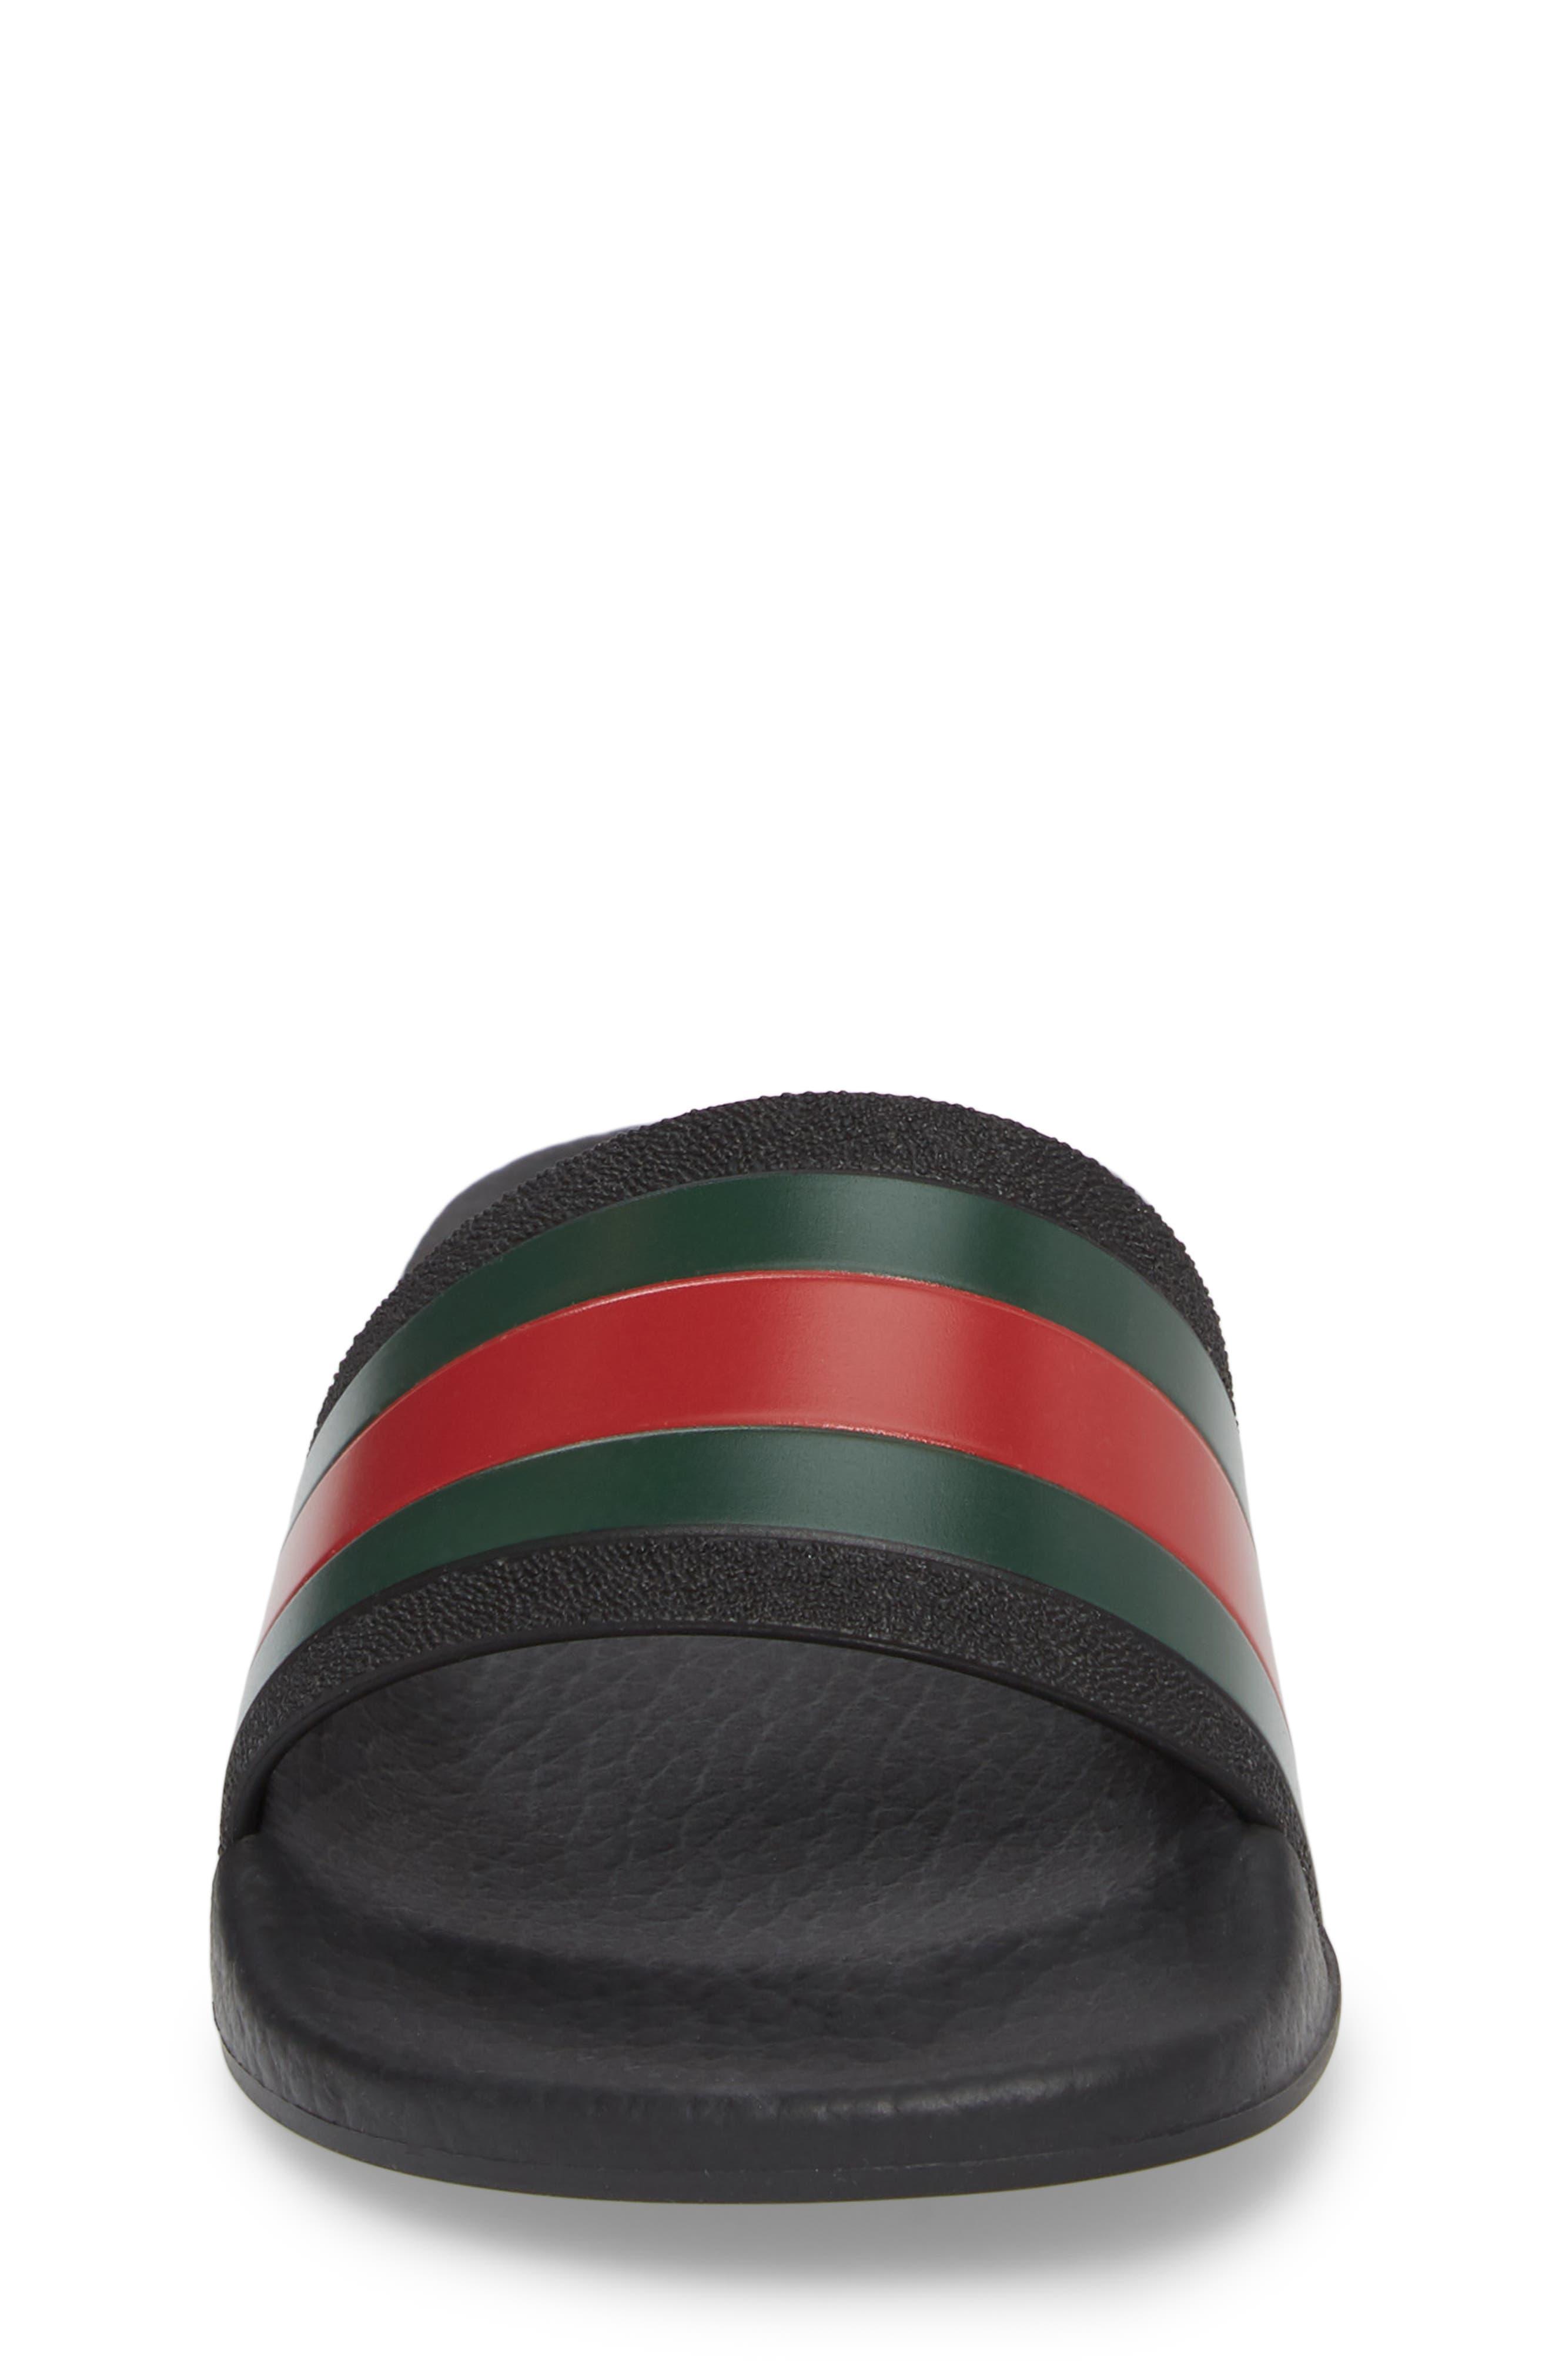 GUCCI, Pursuit Slide Sandal, Alternate thumbnail 4, color, BLACK/ GREEN/ RED